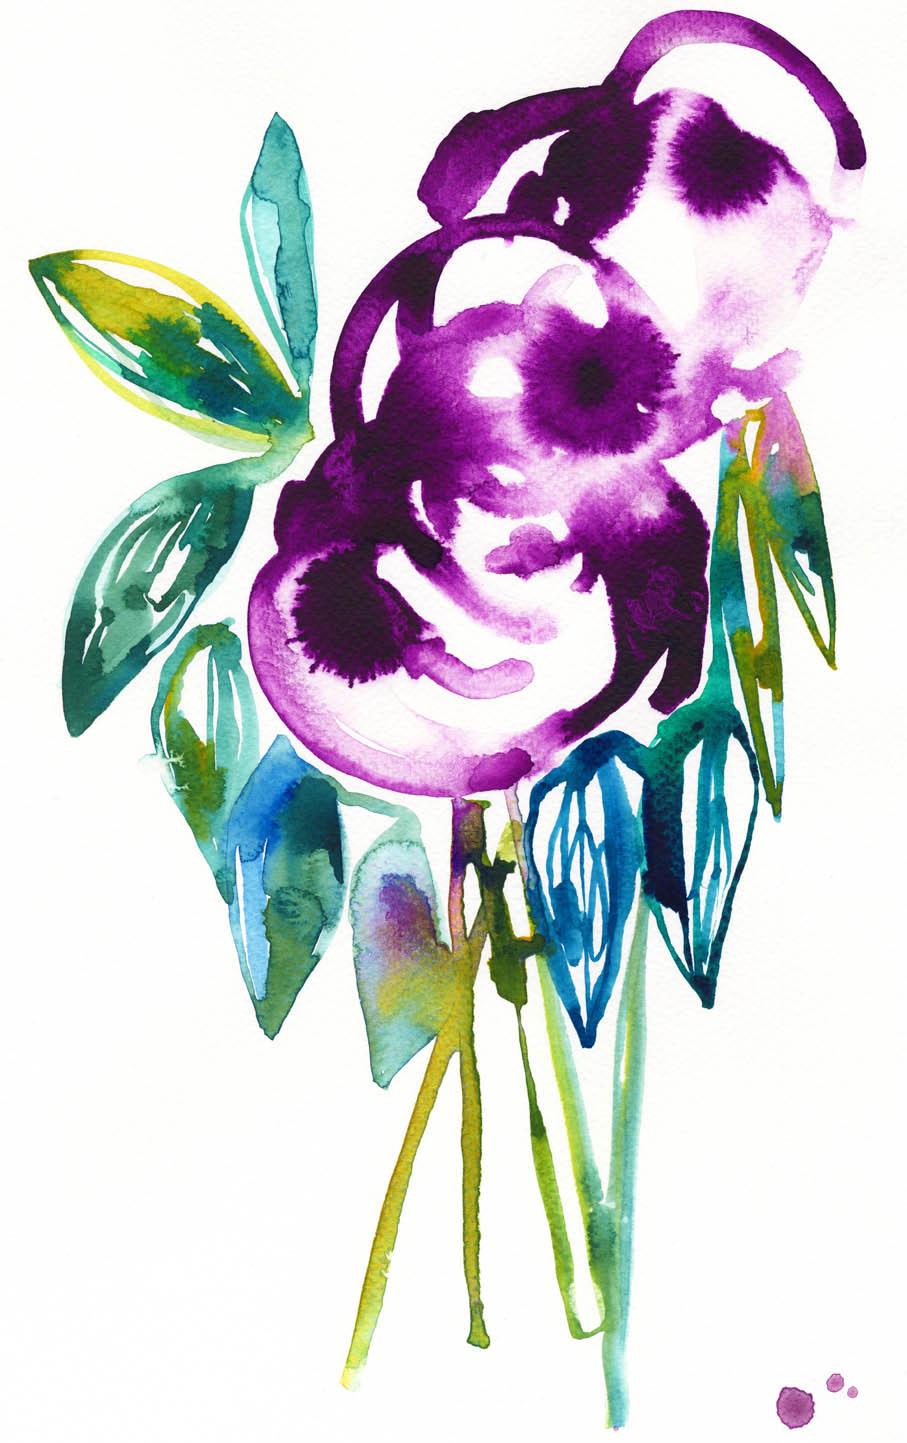 Big bloom Holly Sharpe for web.jpg